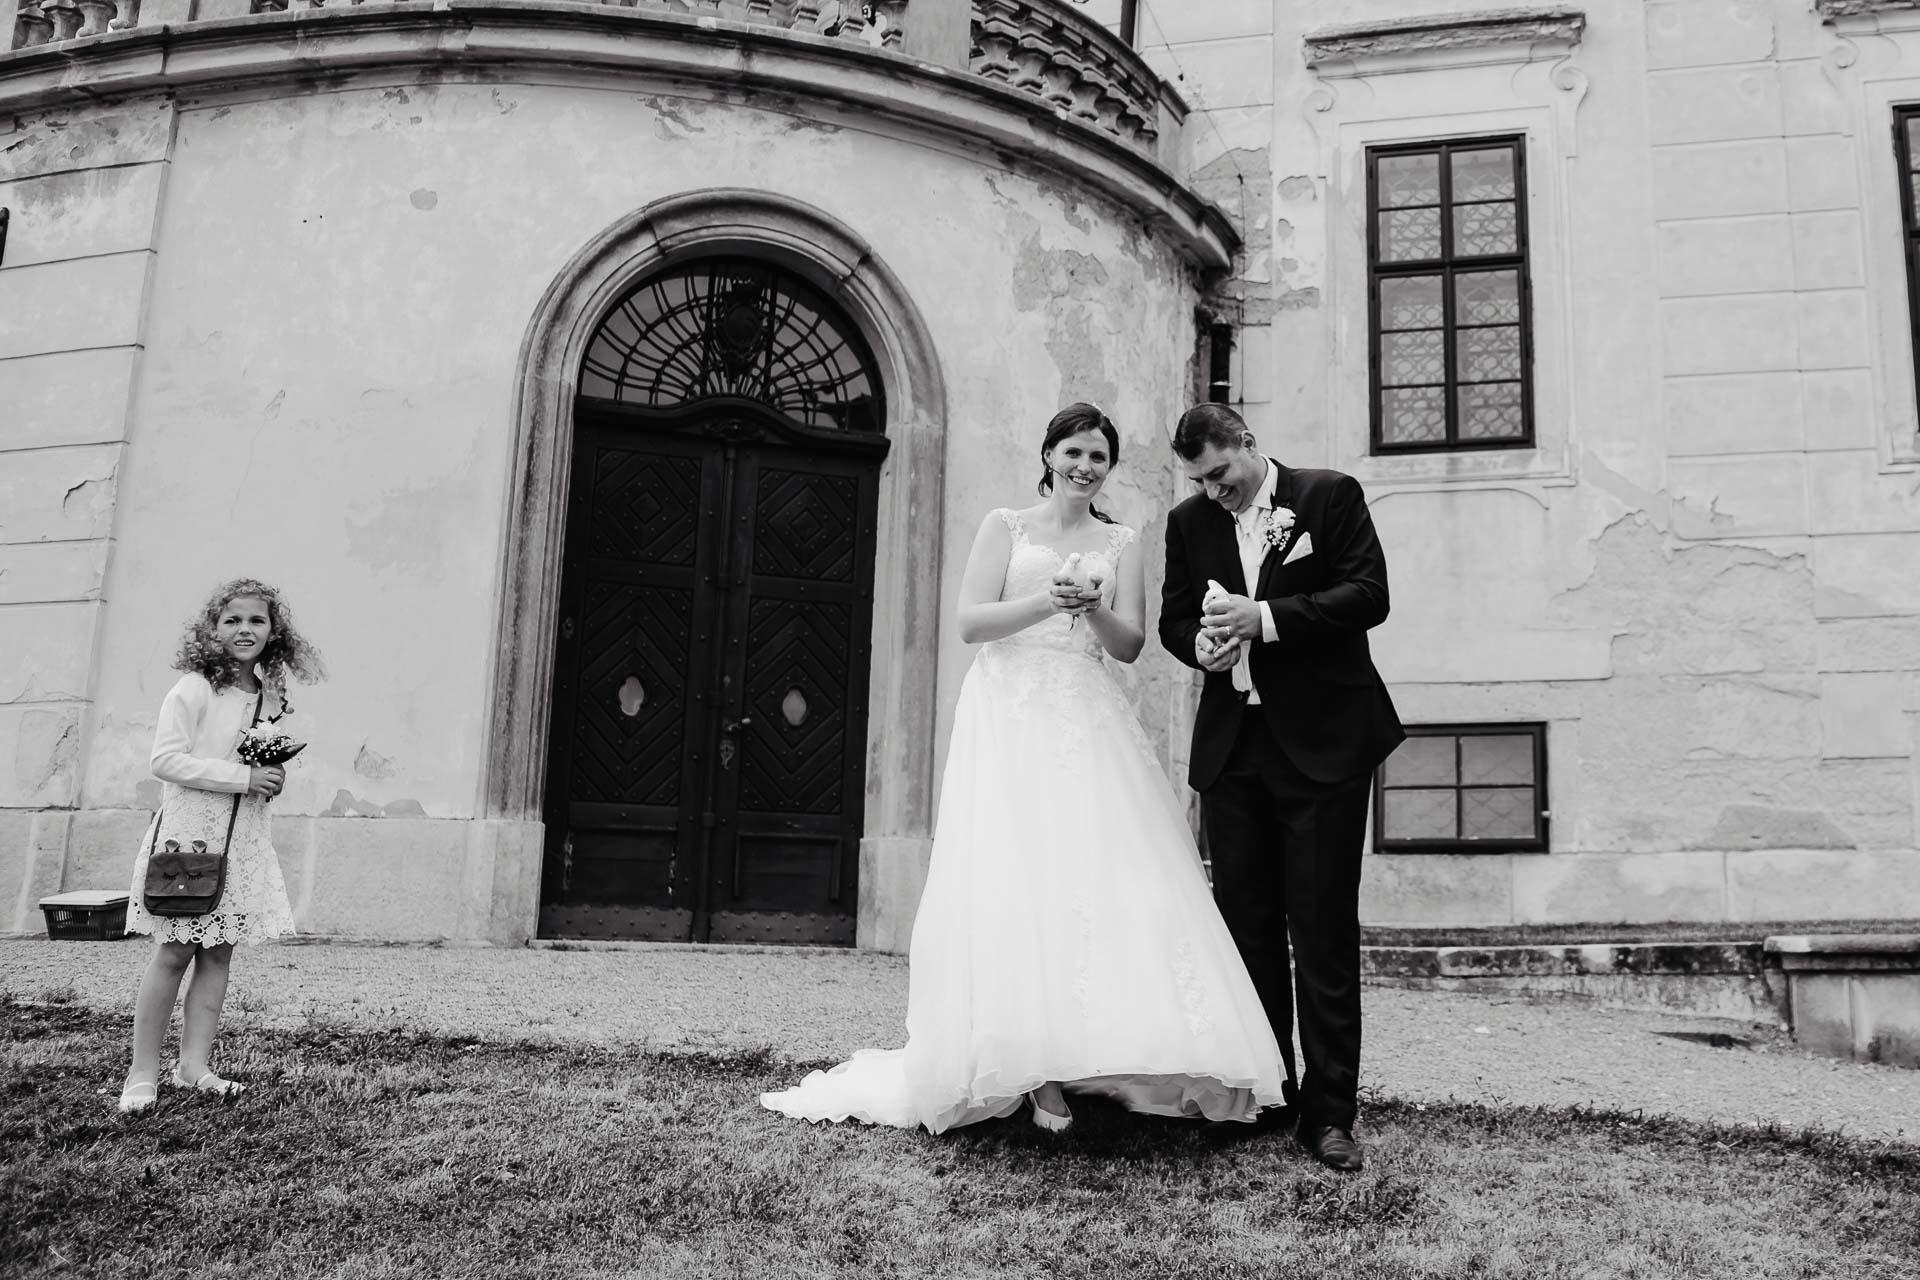 Svatební-fotograf-zámek-Karlova-Koruna-Chlumec-nad-Cidlinou-115